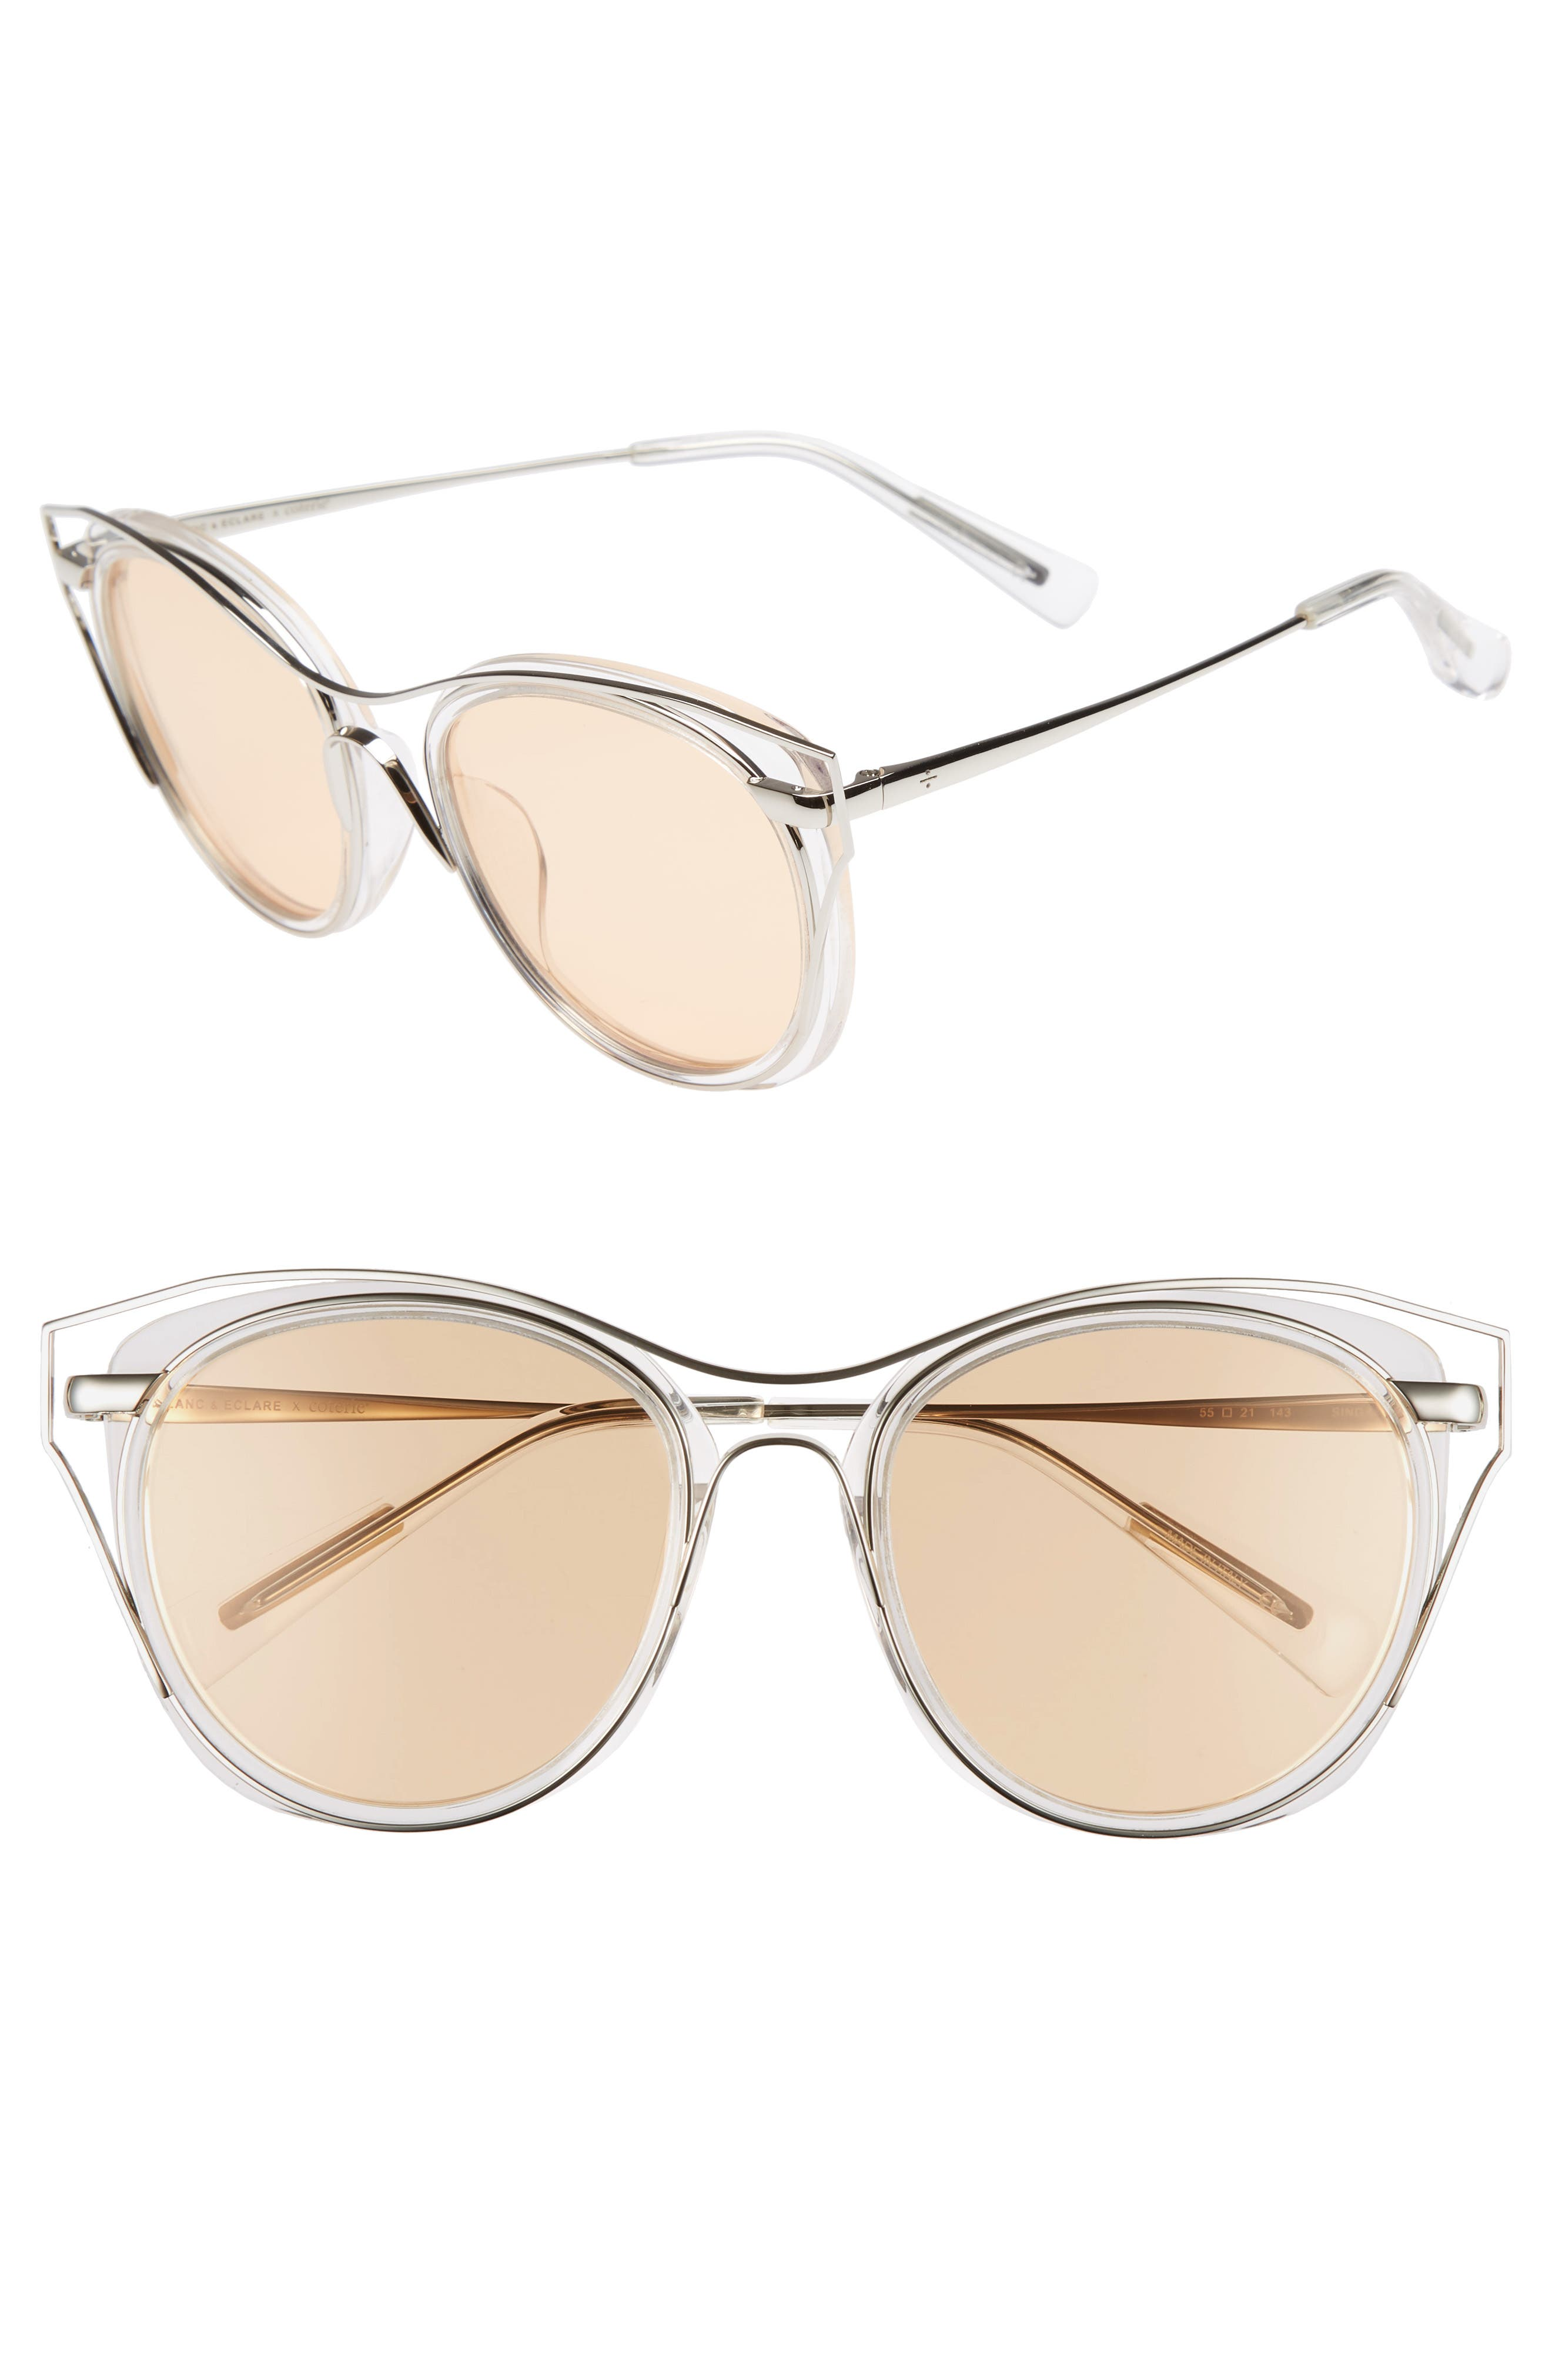 BLANC & ECLARE Singapore 55mm Polarized Sunglasses,                             Main thumbnail 1, color,                             Transparent/ Slv/ Orange